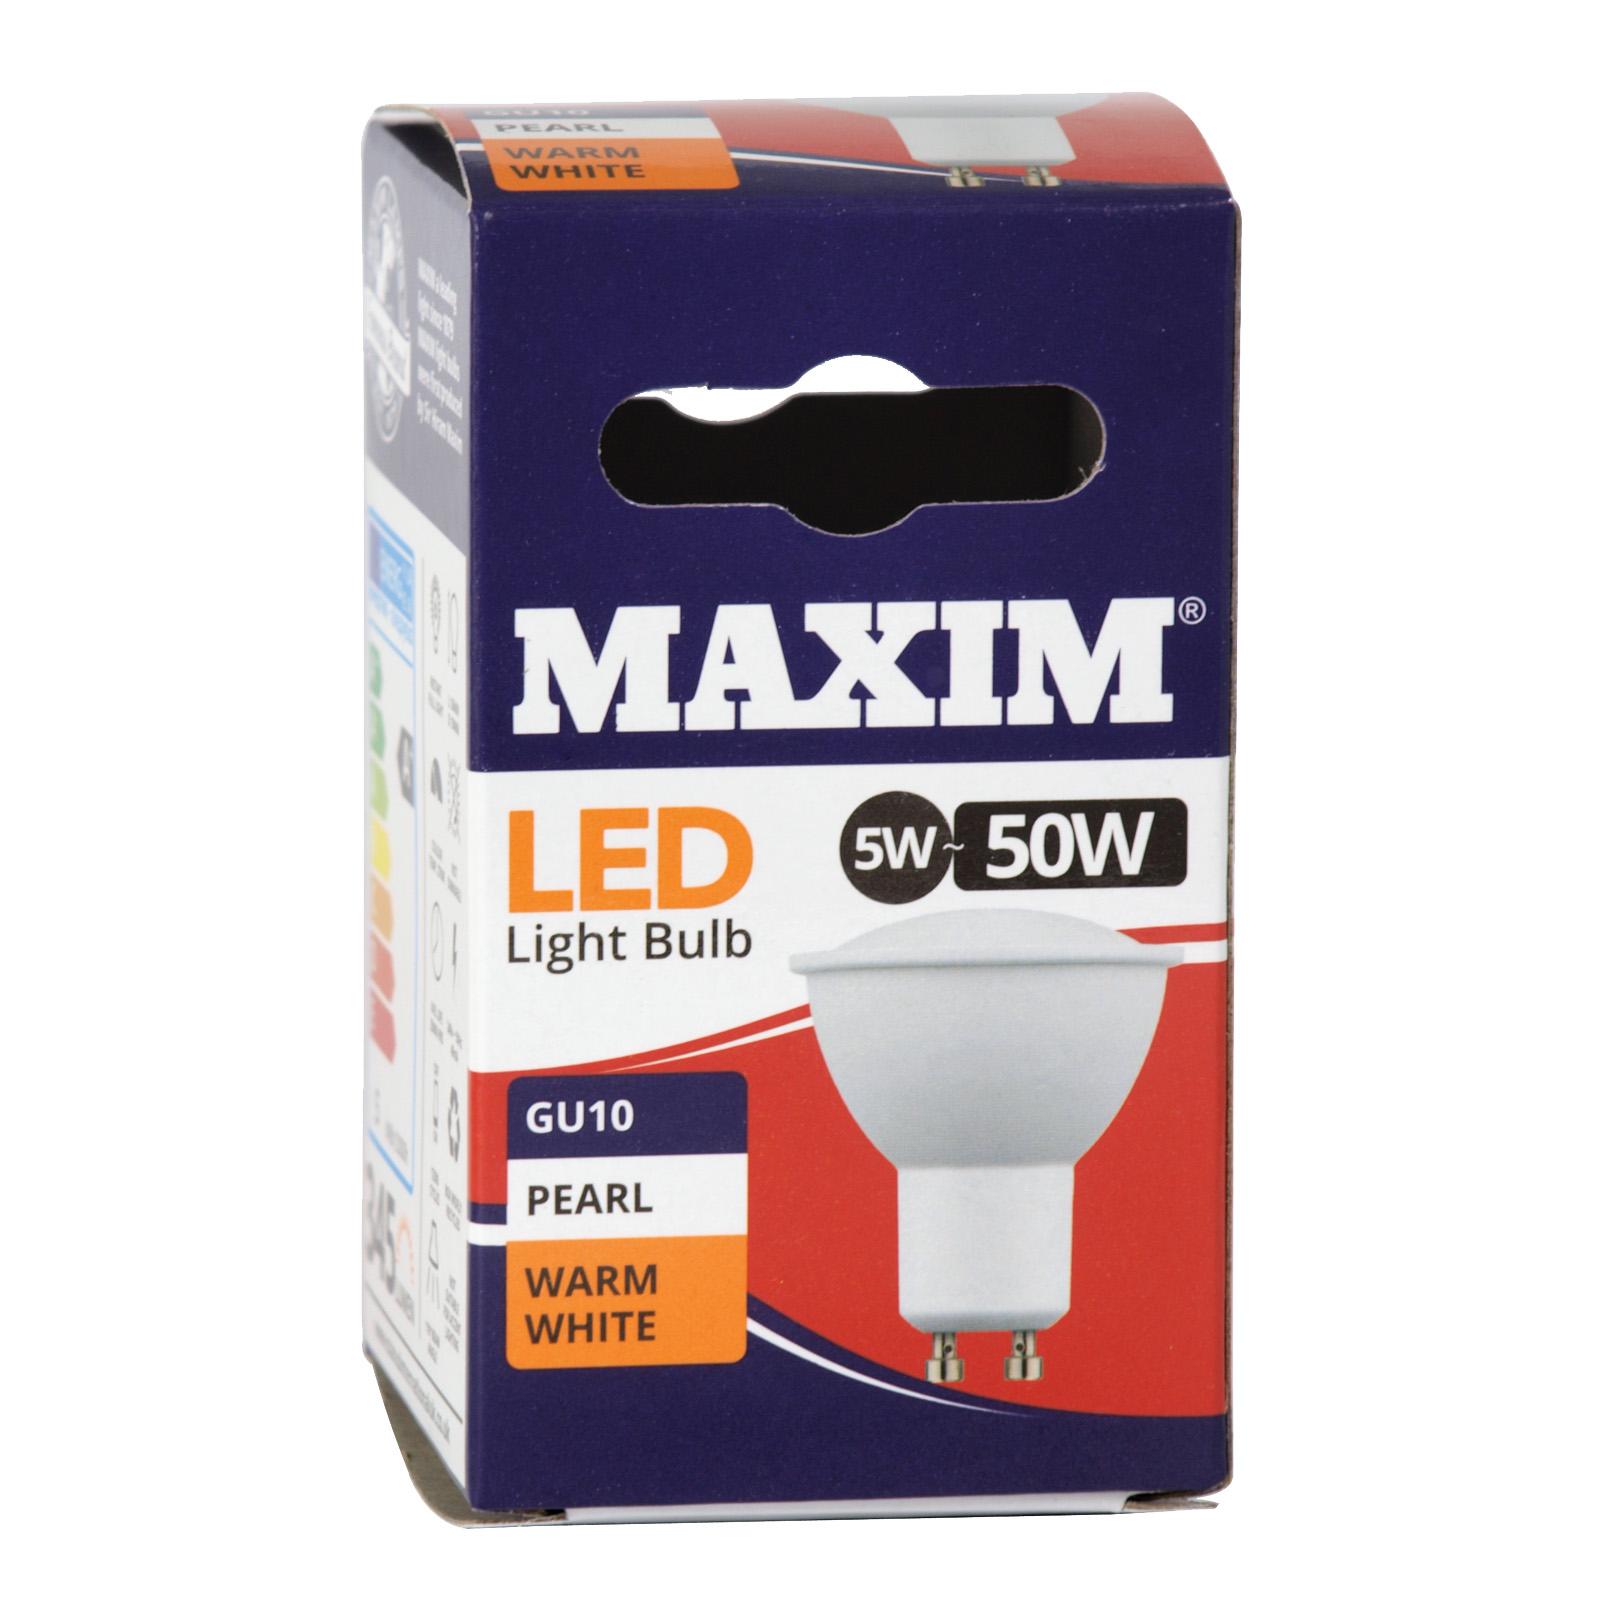 STATUS LED WARM WHITE PEARL LIGHT BULB GU10 5W=50W 345 LUMEN X10